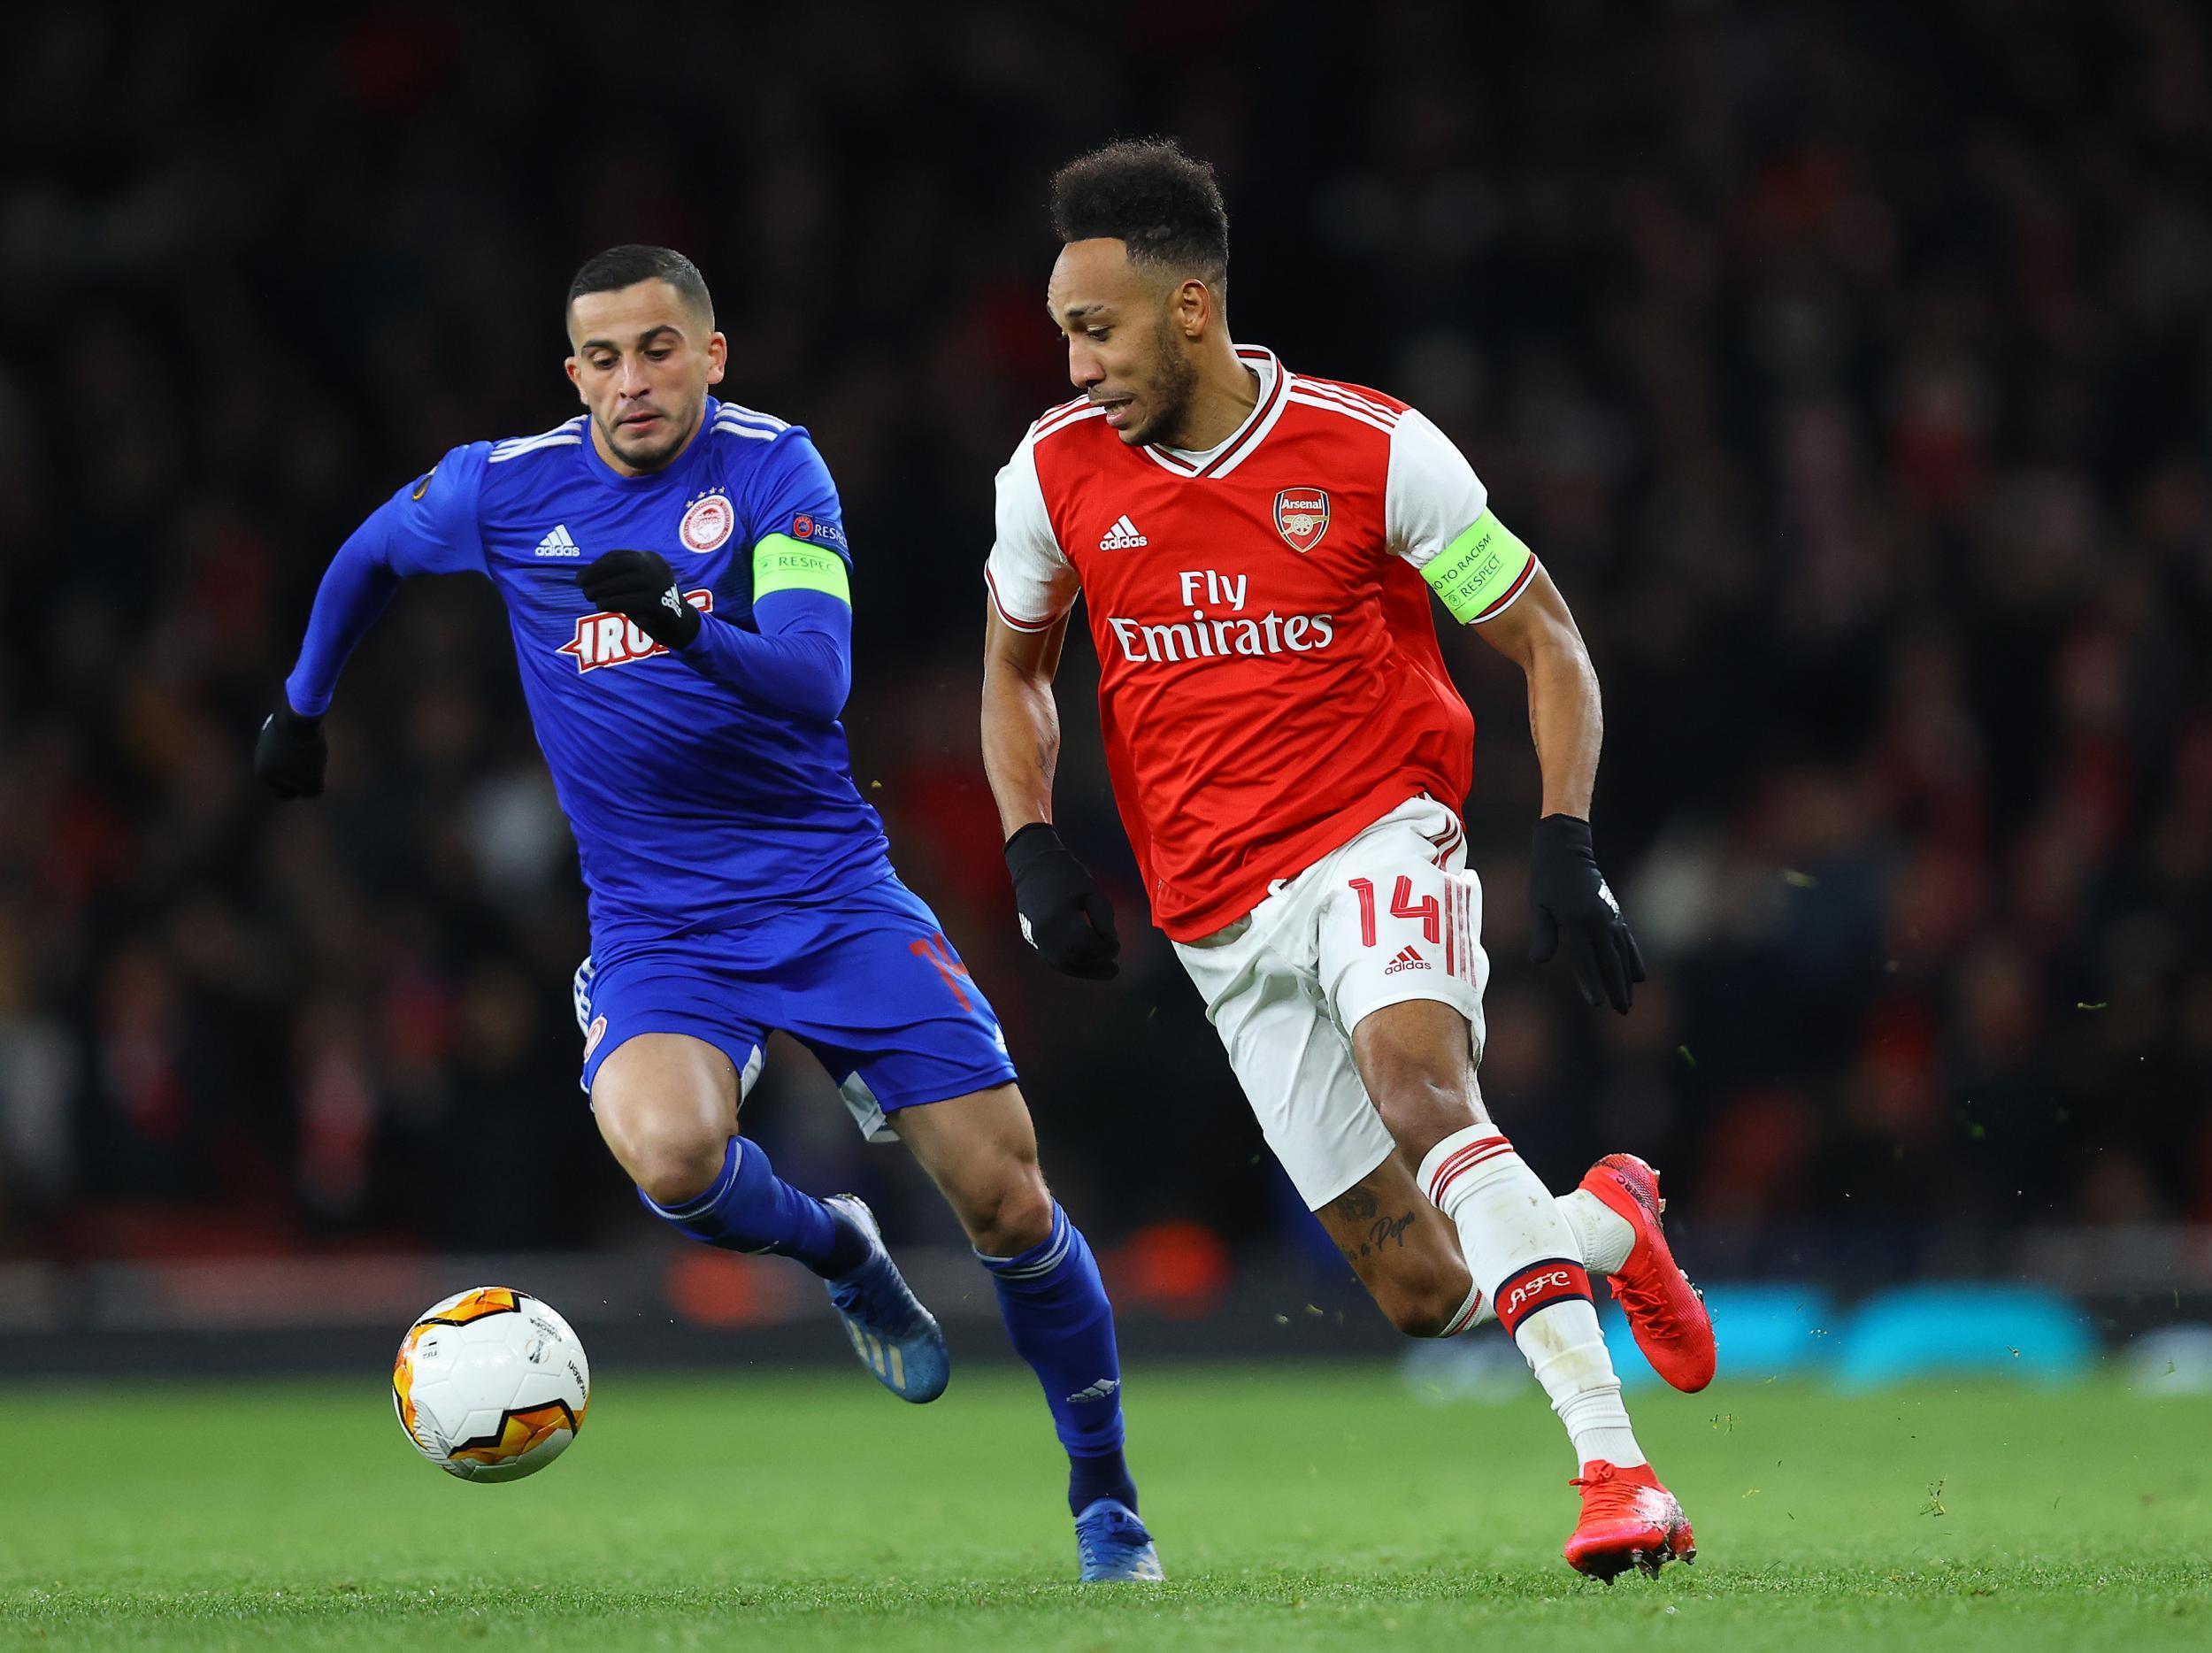 Arsenal vs Olympiacos LIVE – Latest updates